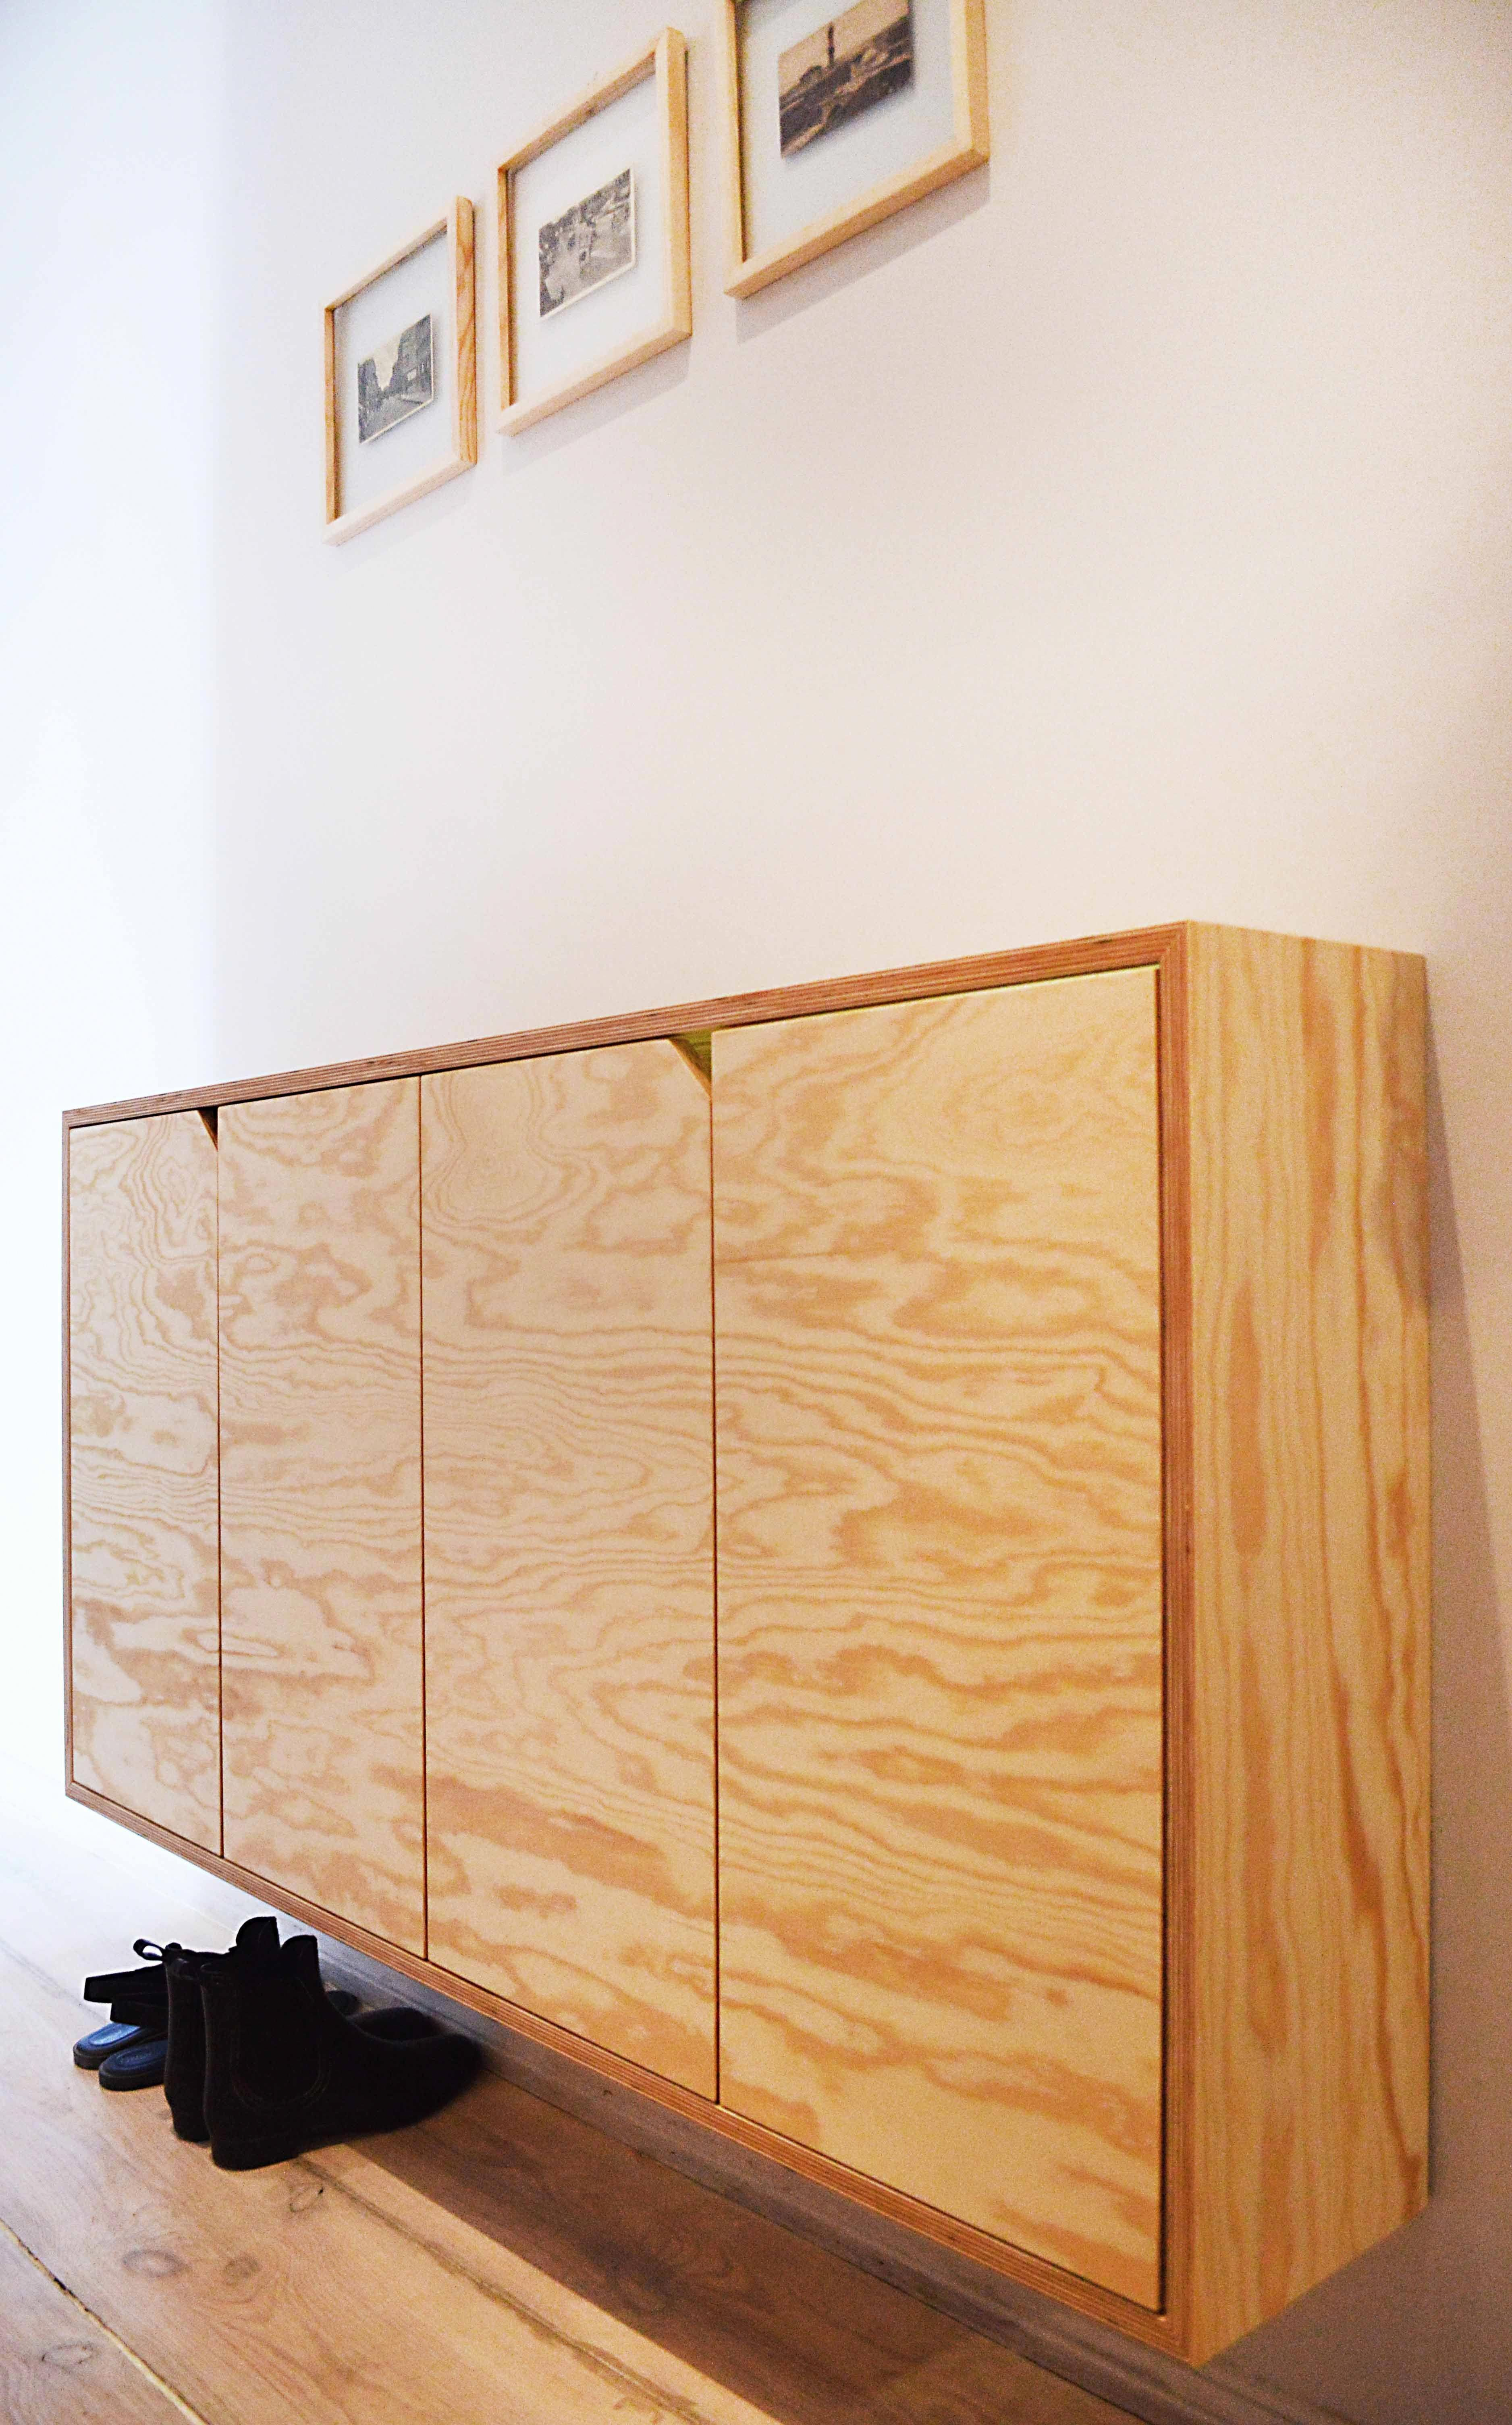 Plywood Furniture Furniture Material Fr Stehtisch 2020 Antre Dekorasyonu Depolama Tasarim